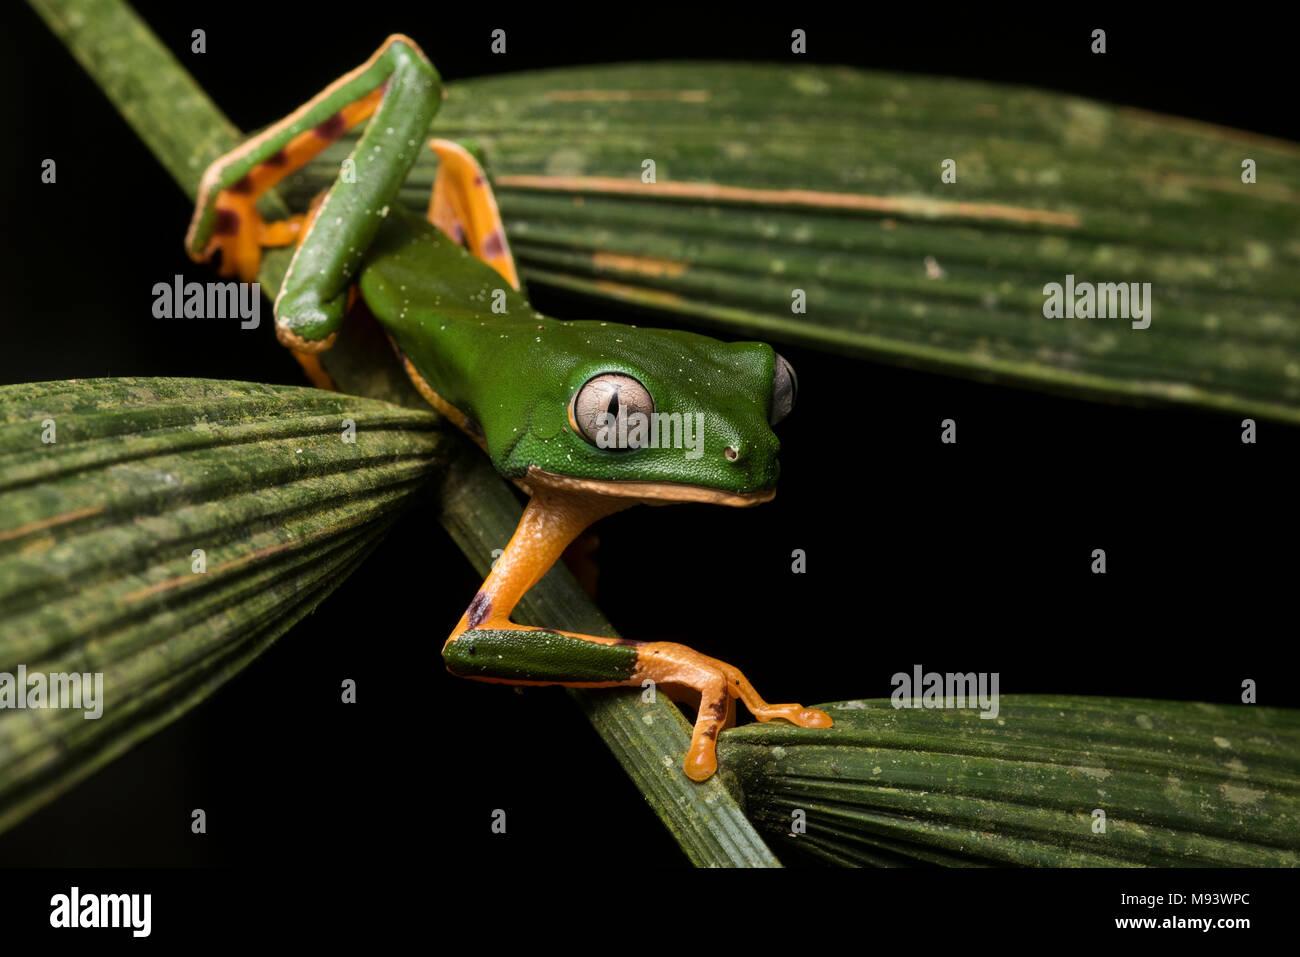 A Phyllomedusa (Callimedusa) tomopterna from Peru. - Stock Image